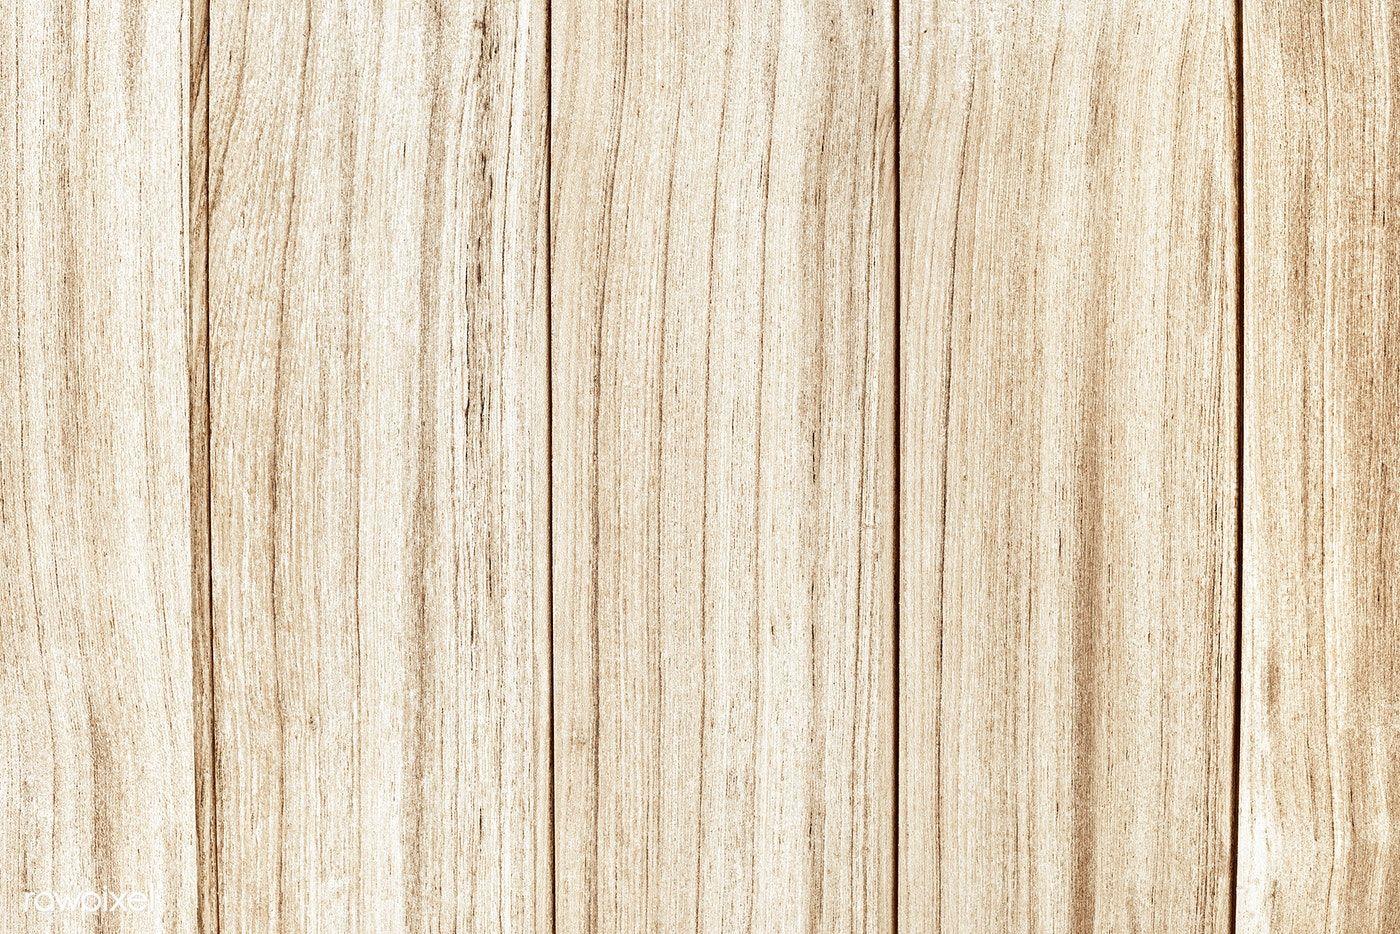 Light Wooden Flooring Textured Background Free Image By Rawpixel Com Flooring Textured Background Wooden Flooring